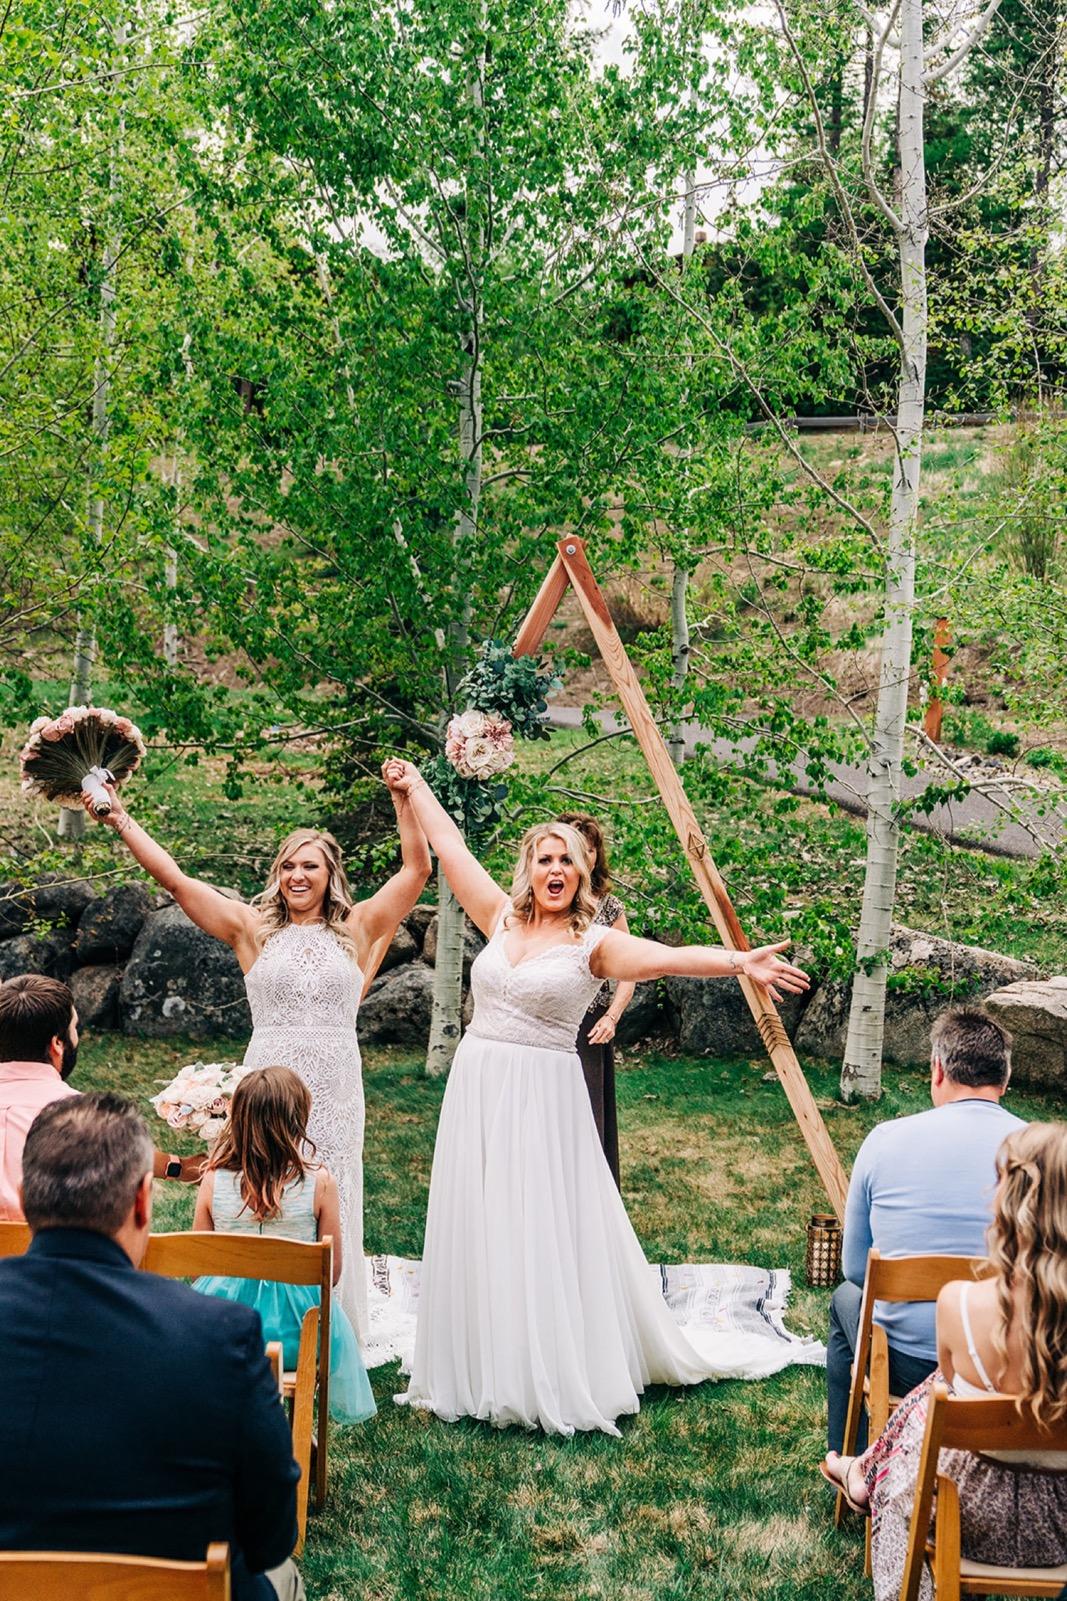 092_falissa_heather_wedding-234.jpg